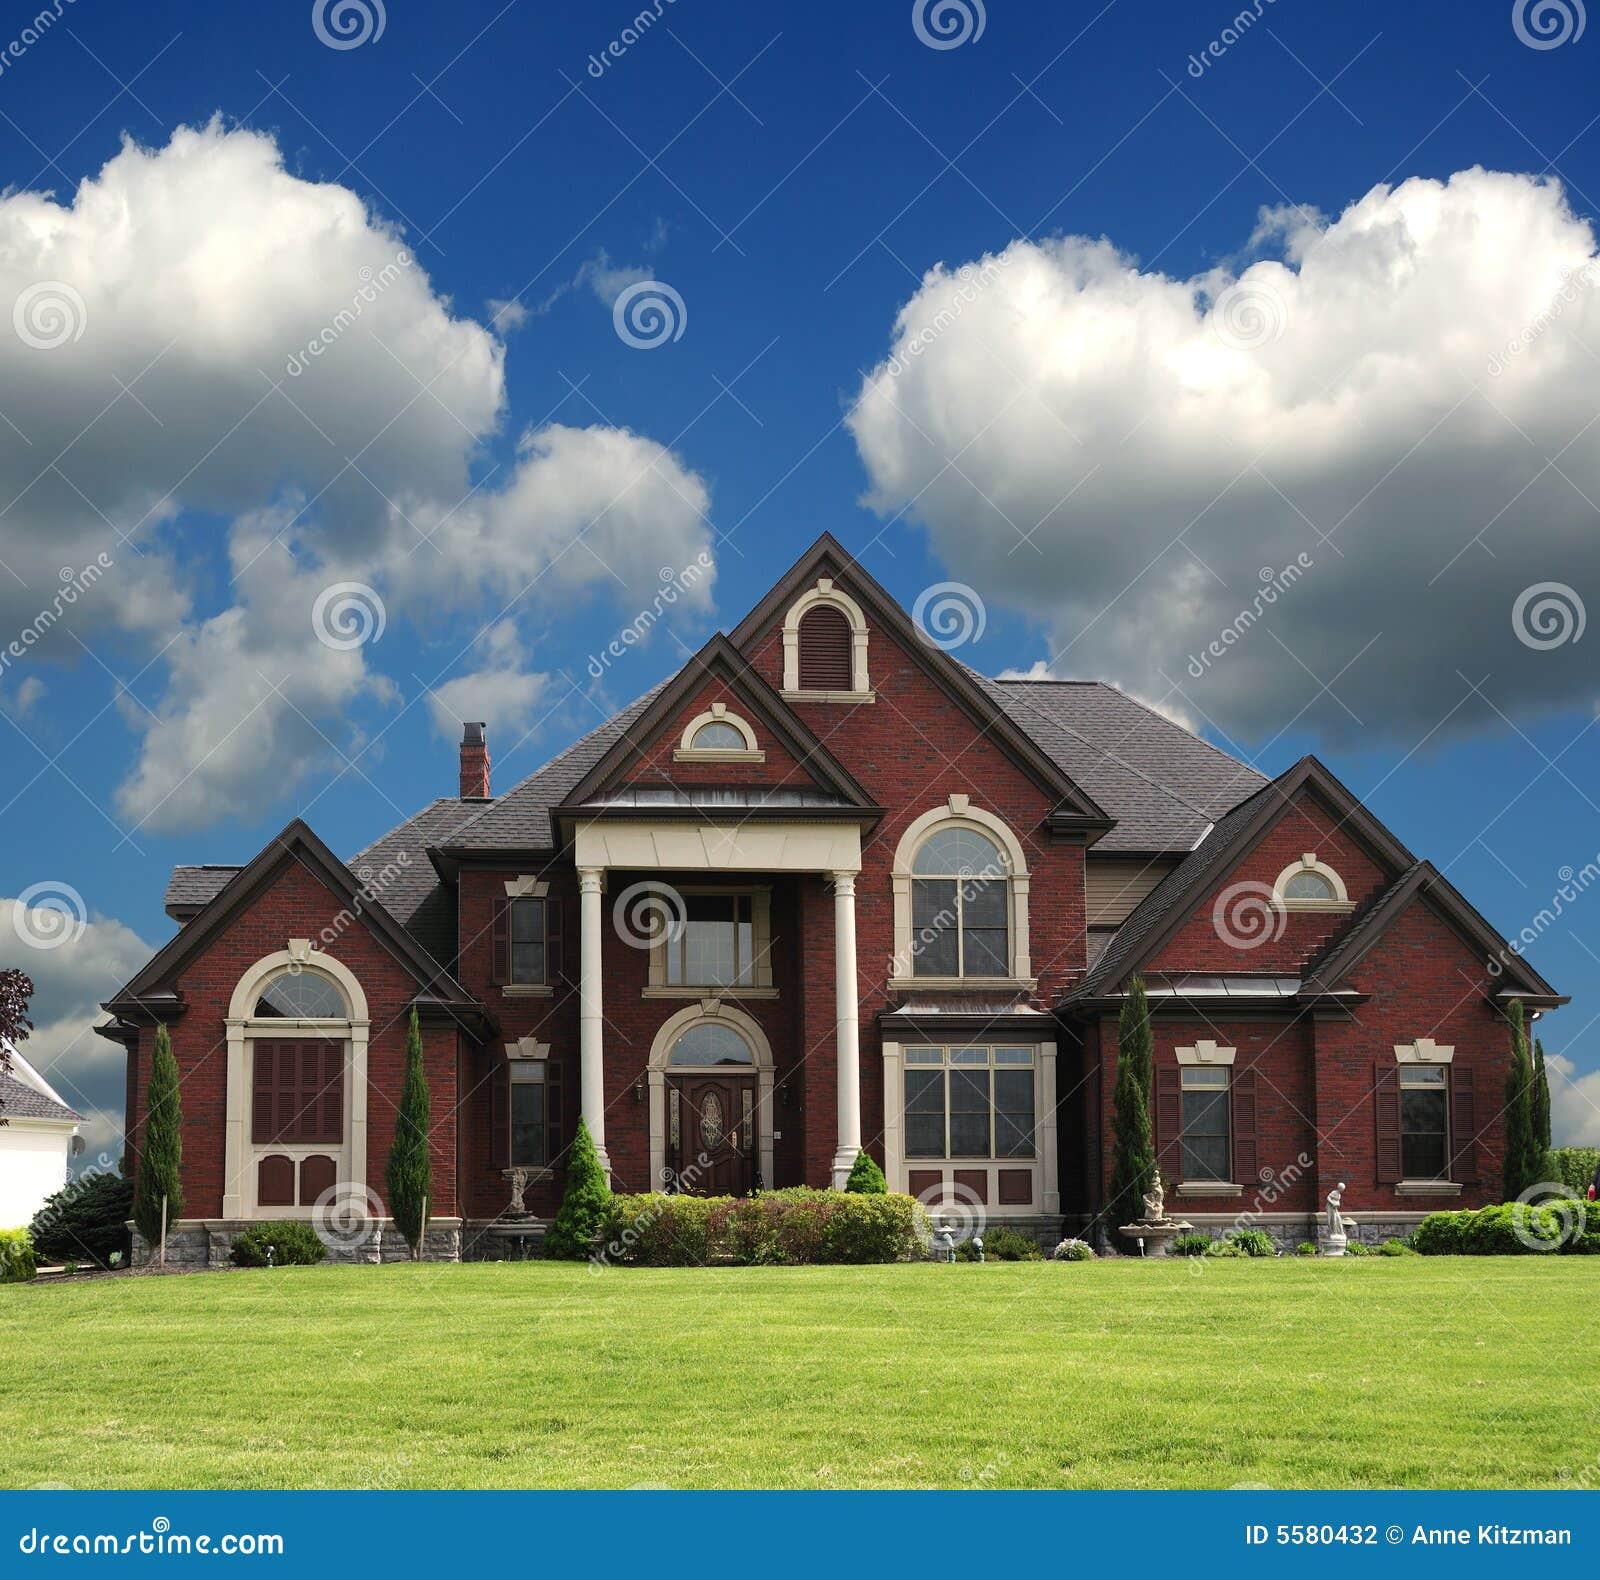 Luxury Brick Homes: Red Brick Mansion Stock Photo. Image Of Shingles, Estate